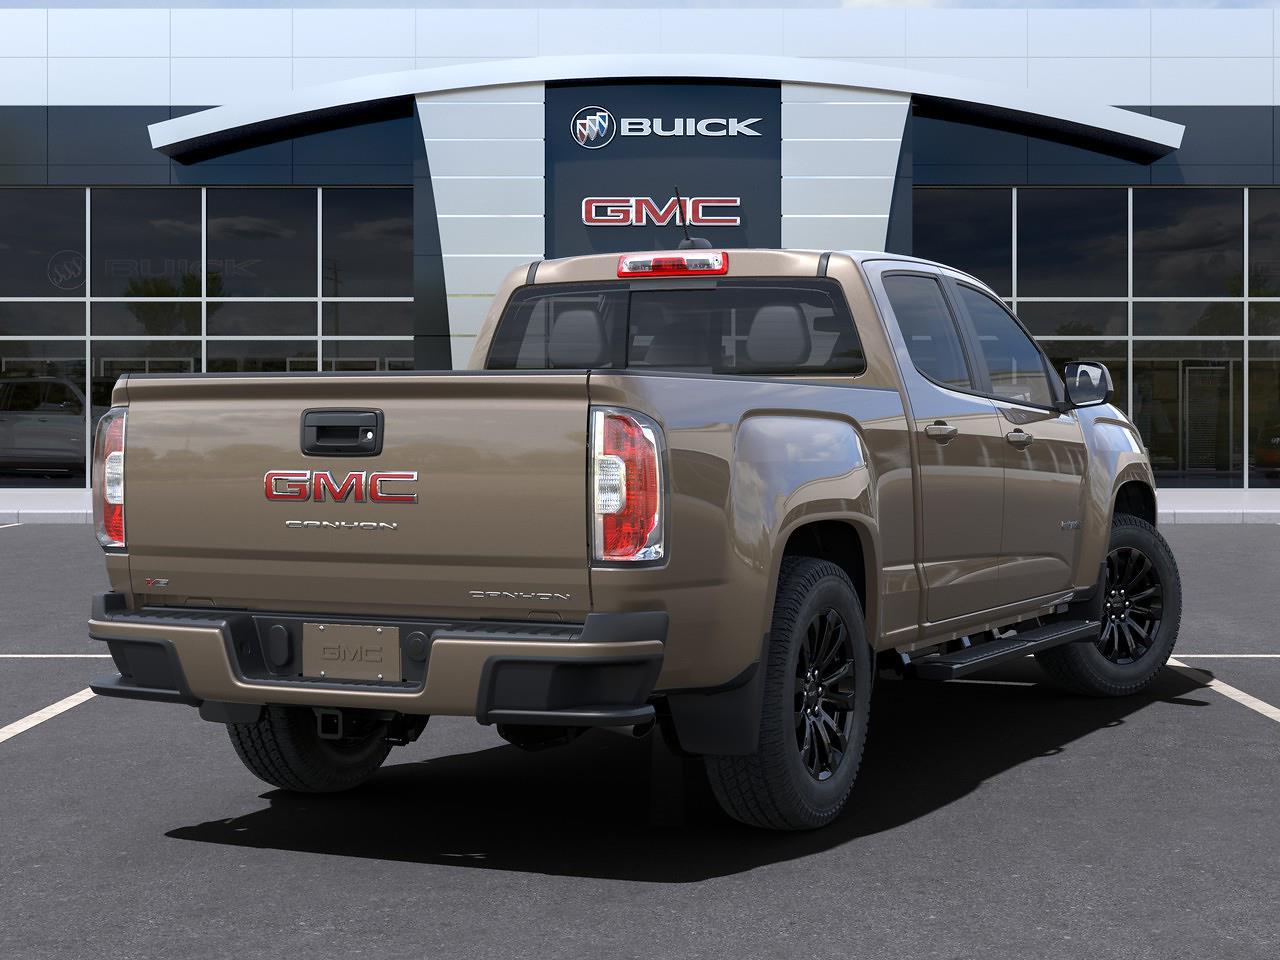 2021 GMC Canyon Crew Cab 4x4, Pickup #C2846 - photo 2